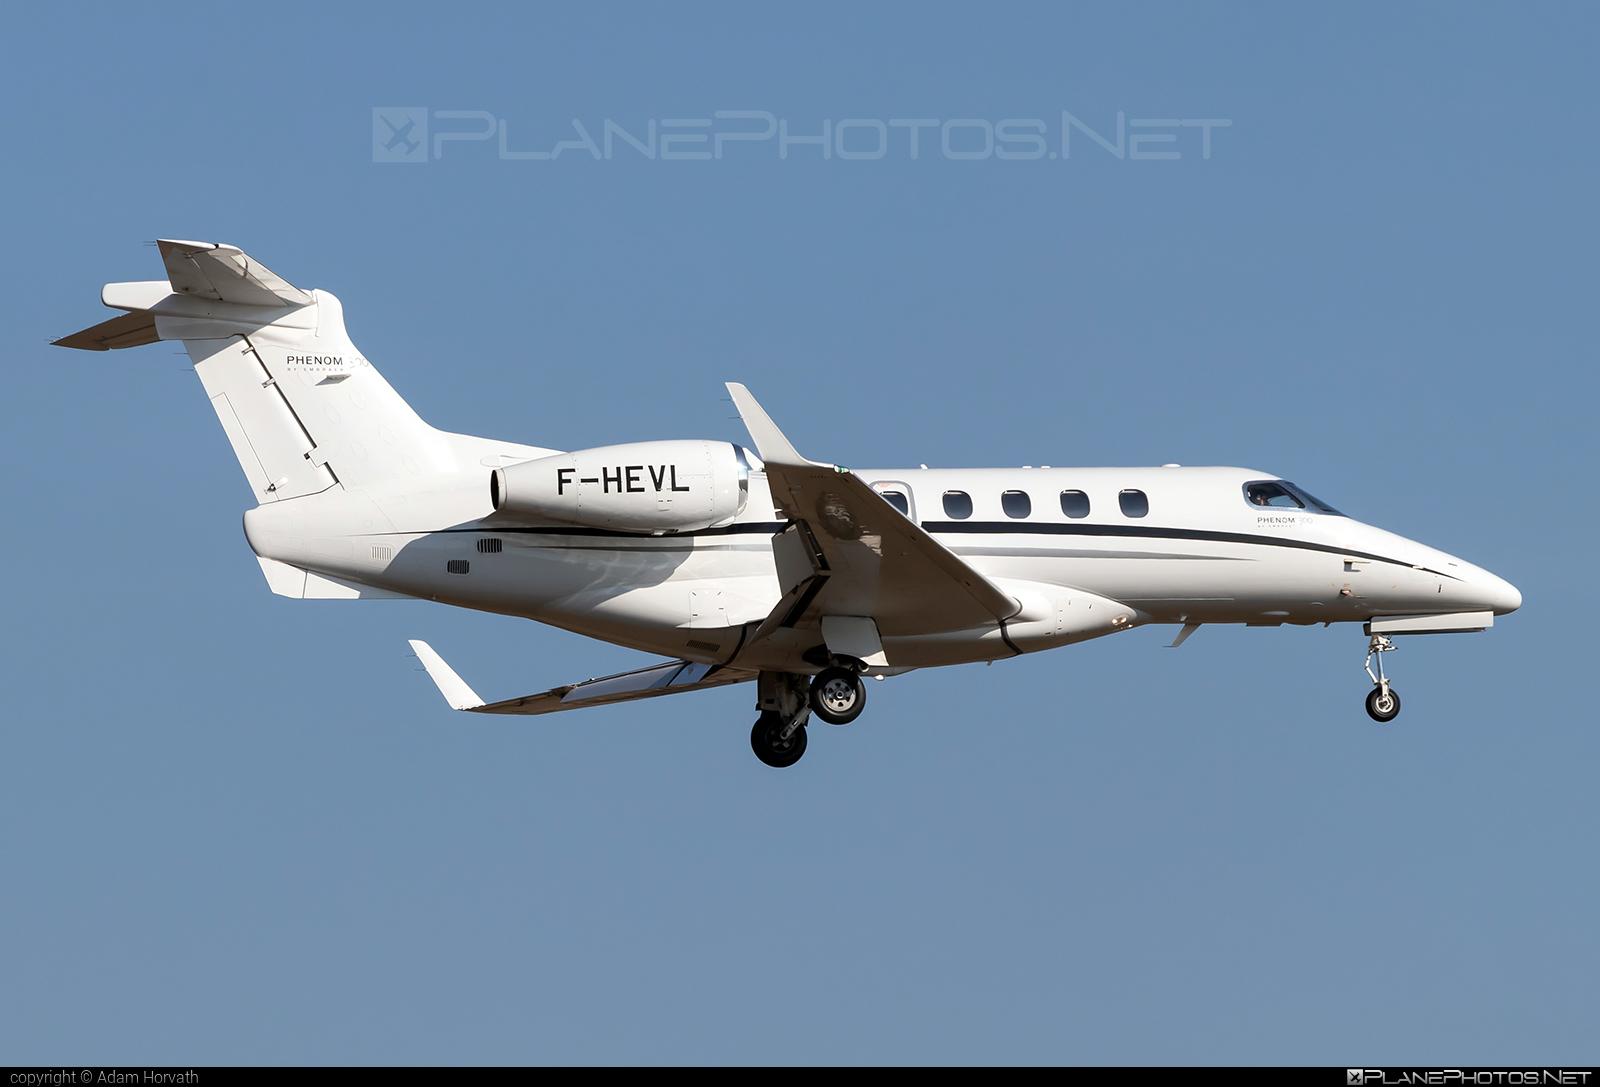 Embraer Phenom 300 (EMB-505) - F-HEVL operated by Private operator #emb505 #embraer #embraer505 #embraerphenom #embraerphenom300 #phenom300